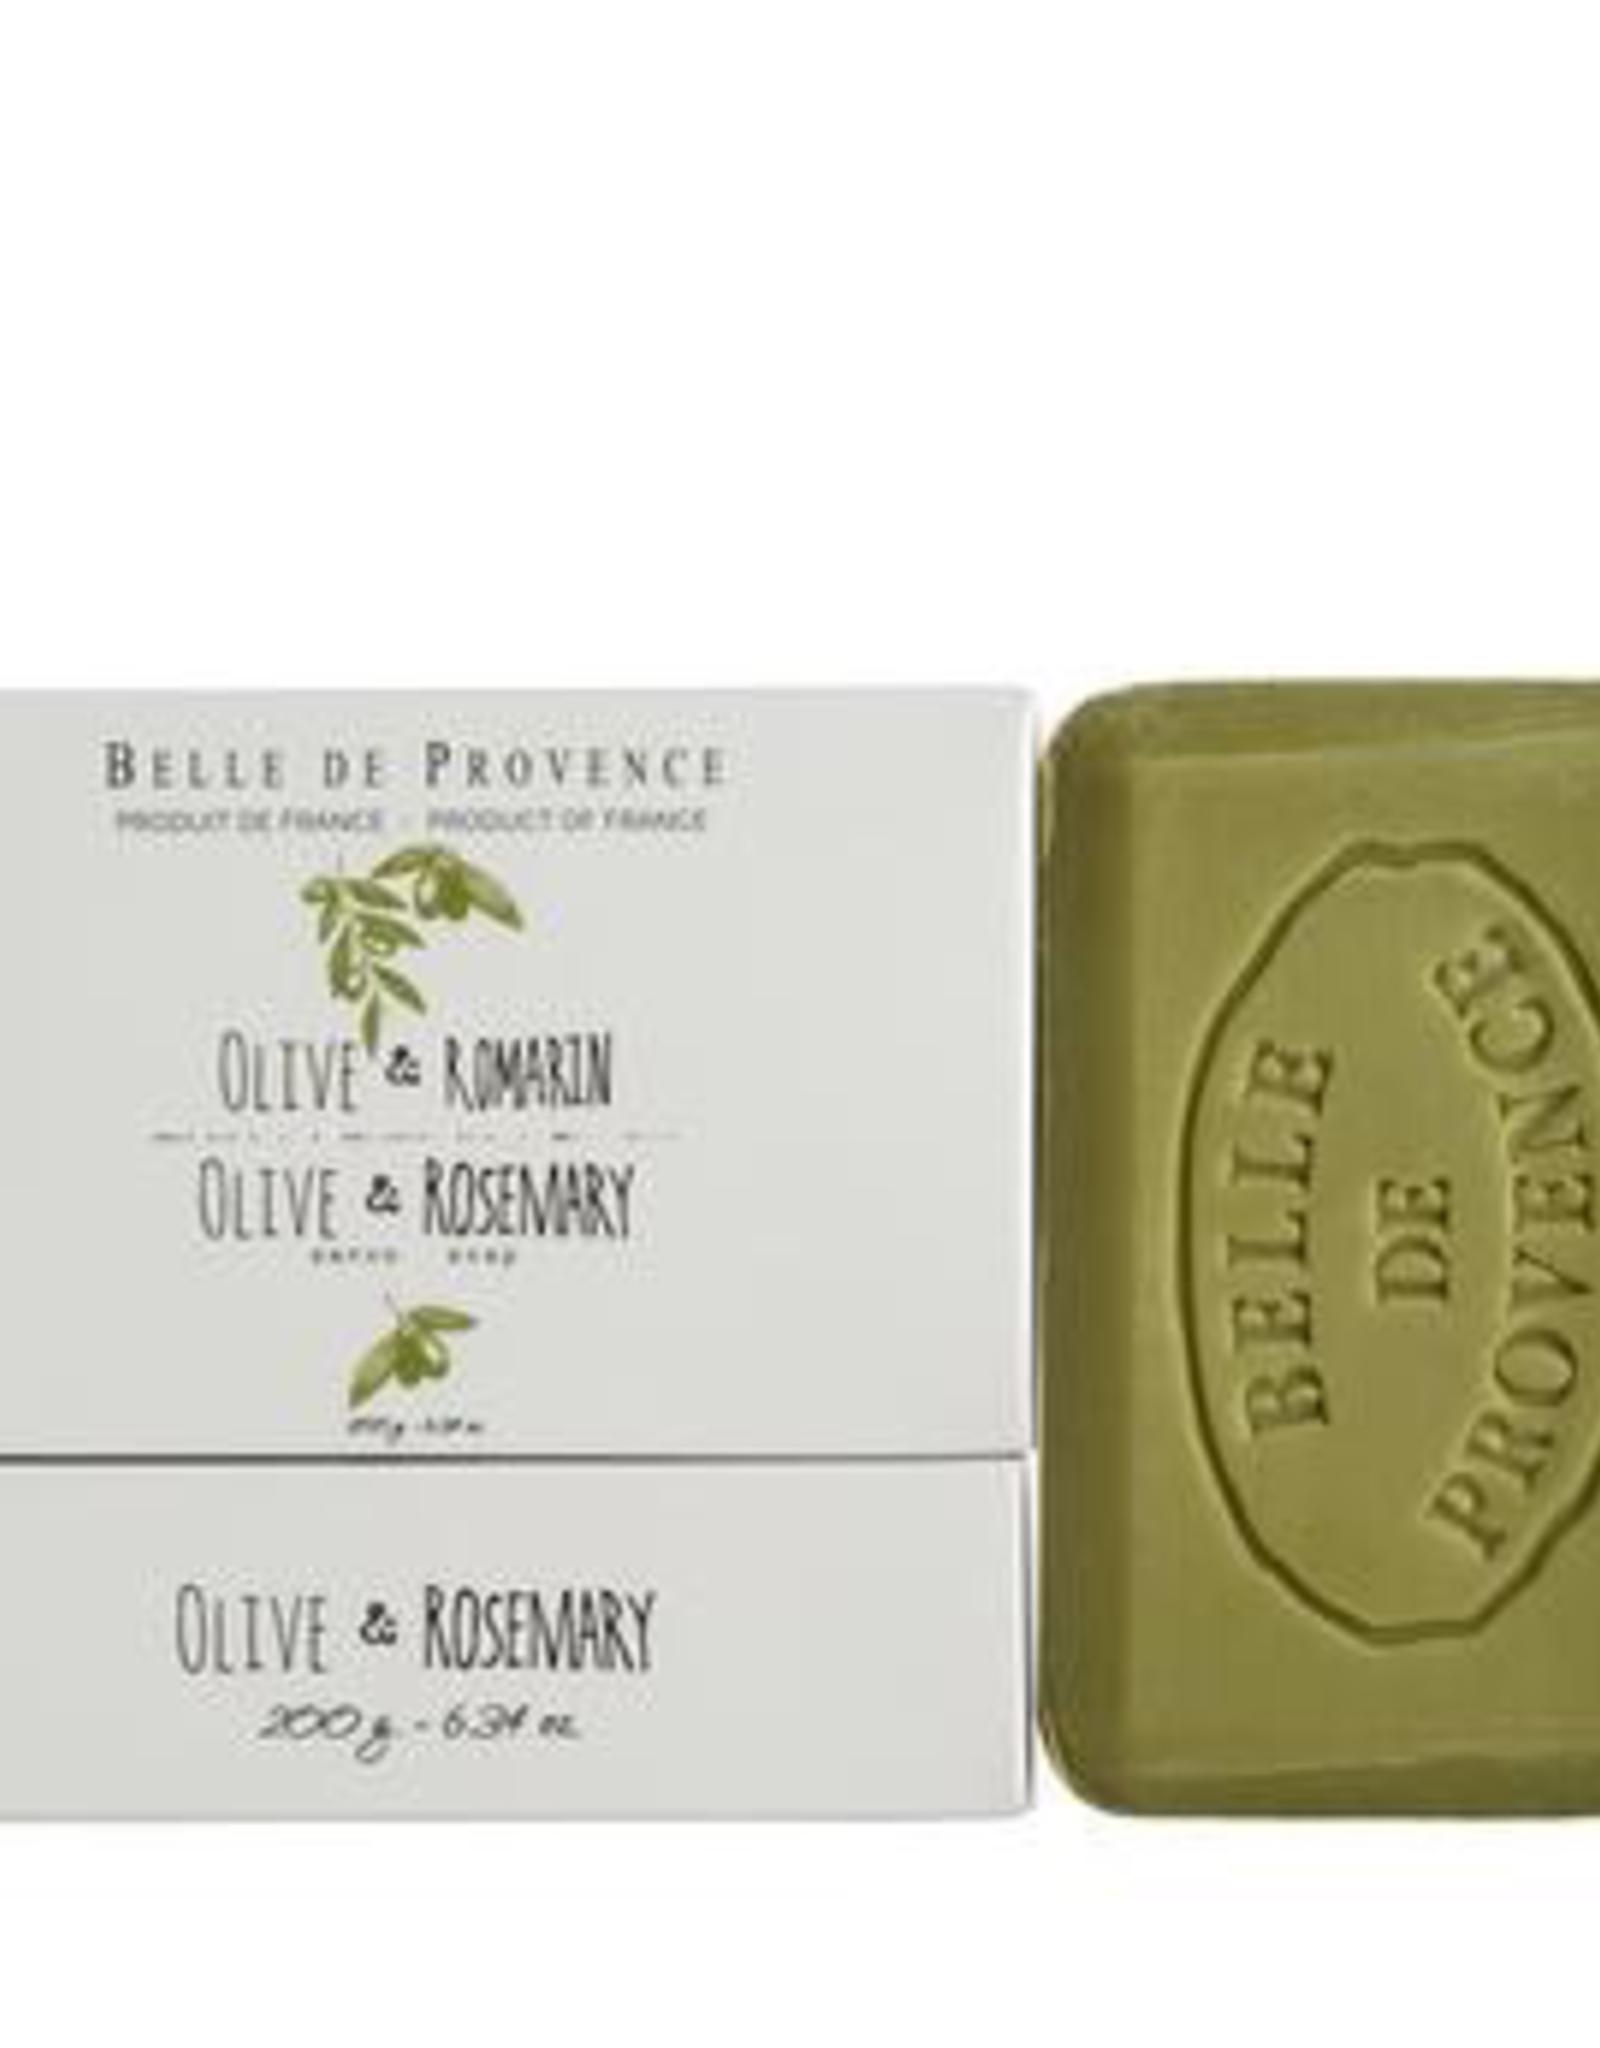 Olive Oil & Rosemary Soap